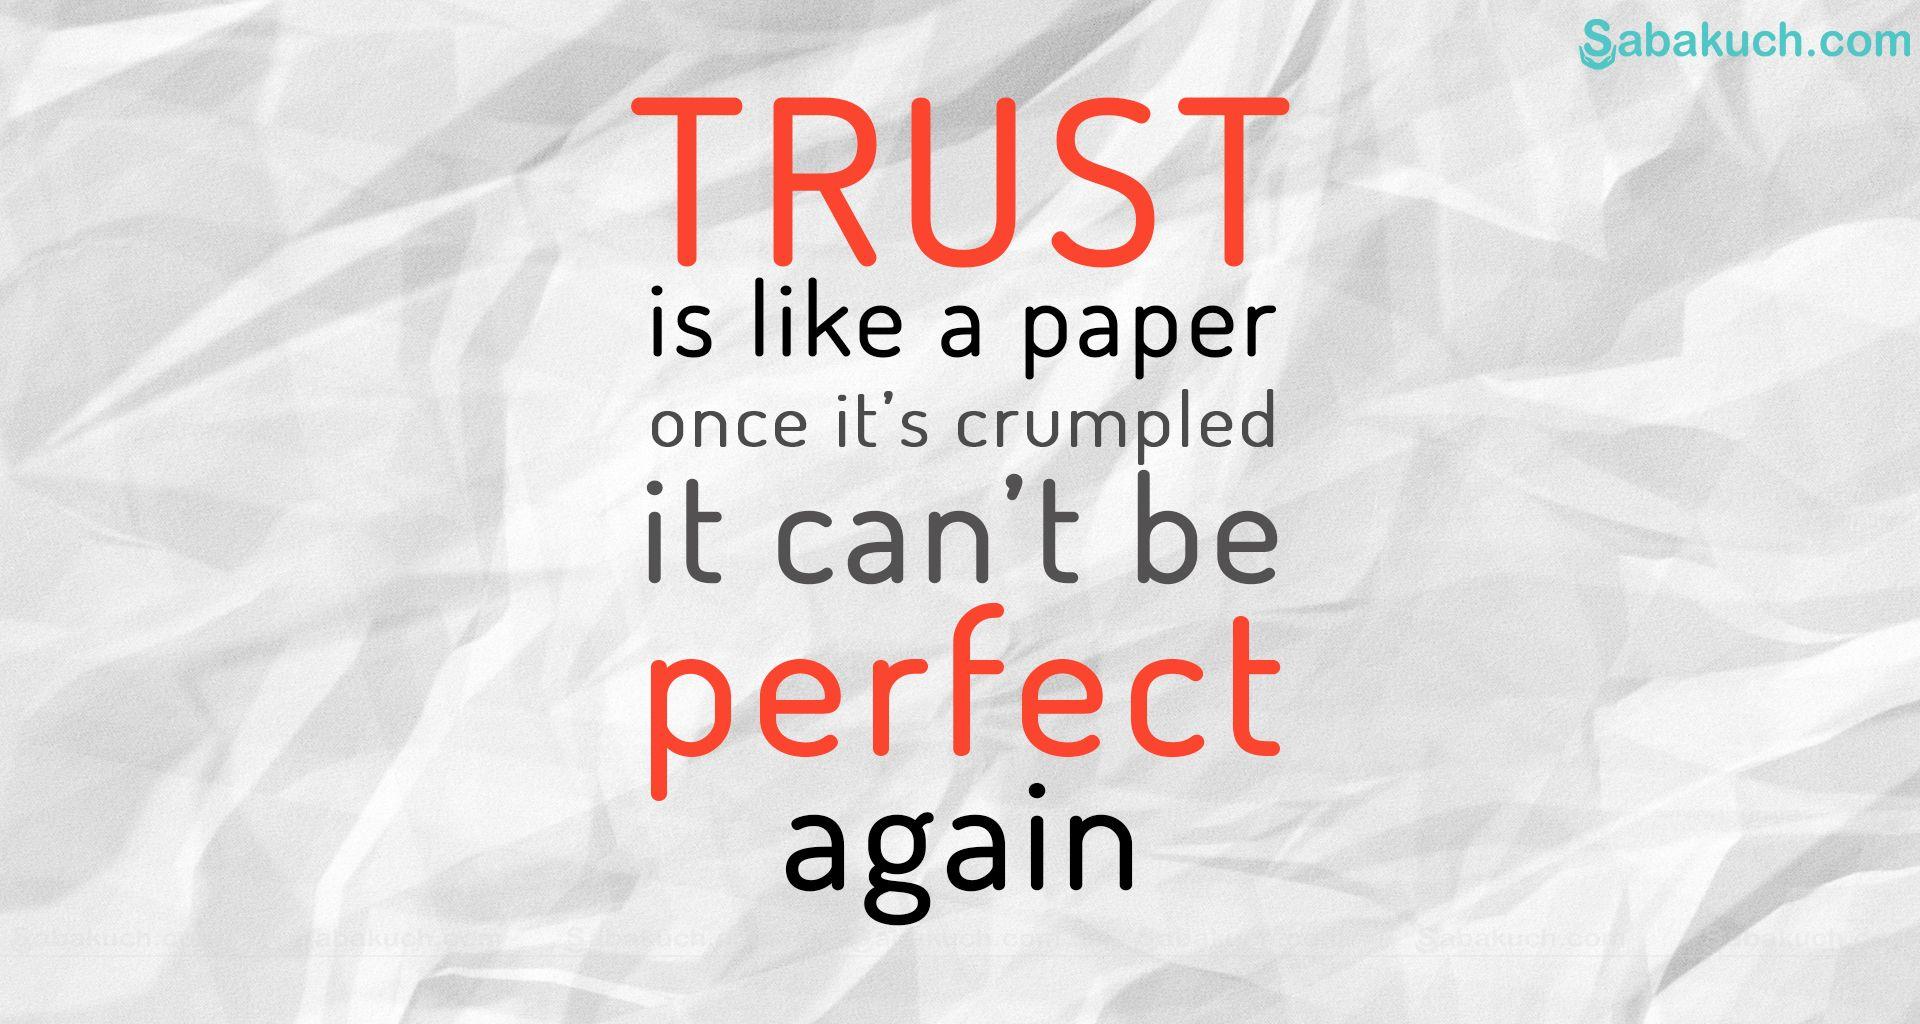 Trust Is Like A Paper Once Itu0027s Crumpled It Canu0027t Be Perfect Again !!